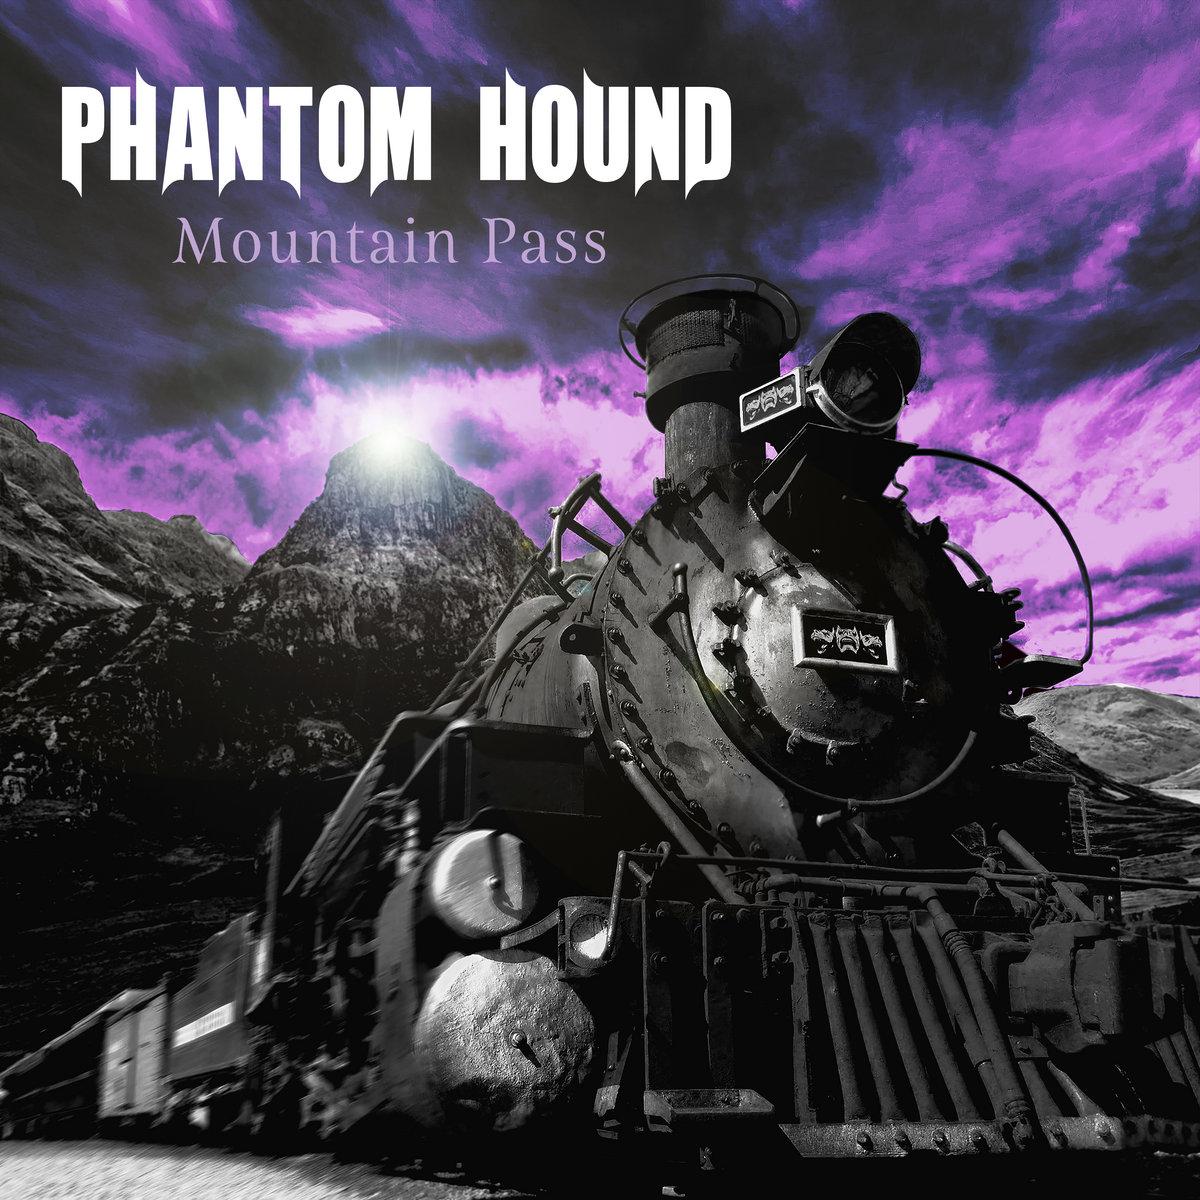 Phantom Hound Mountain Pass